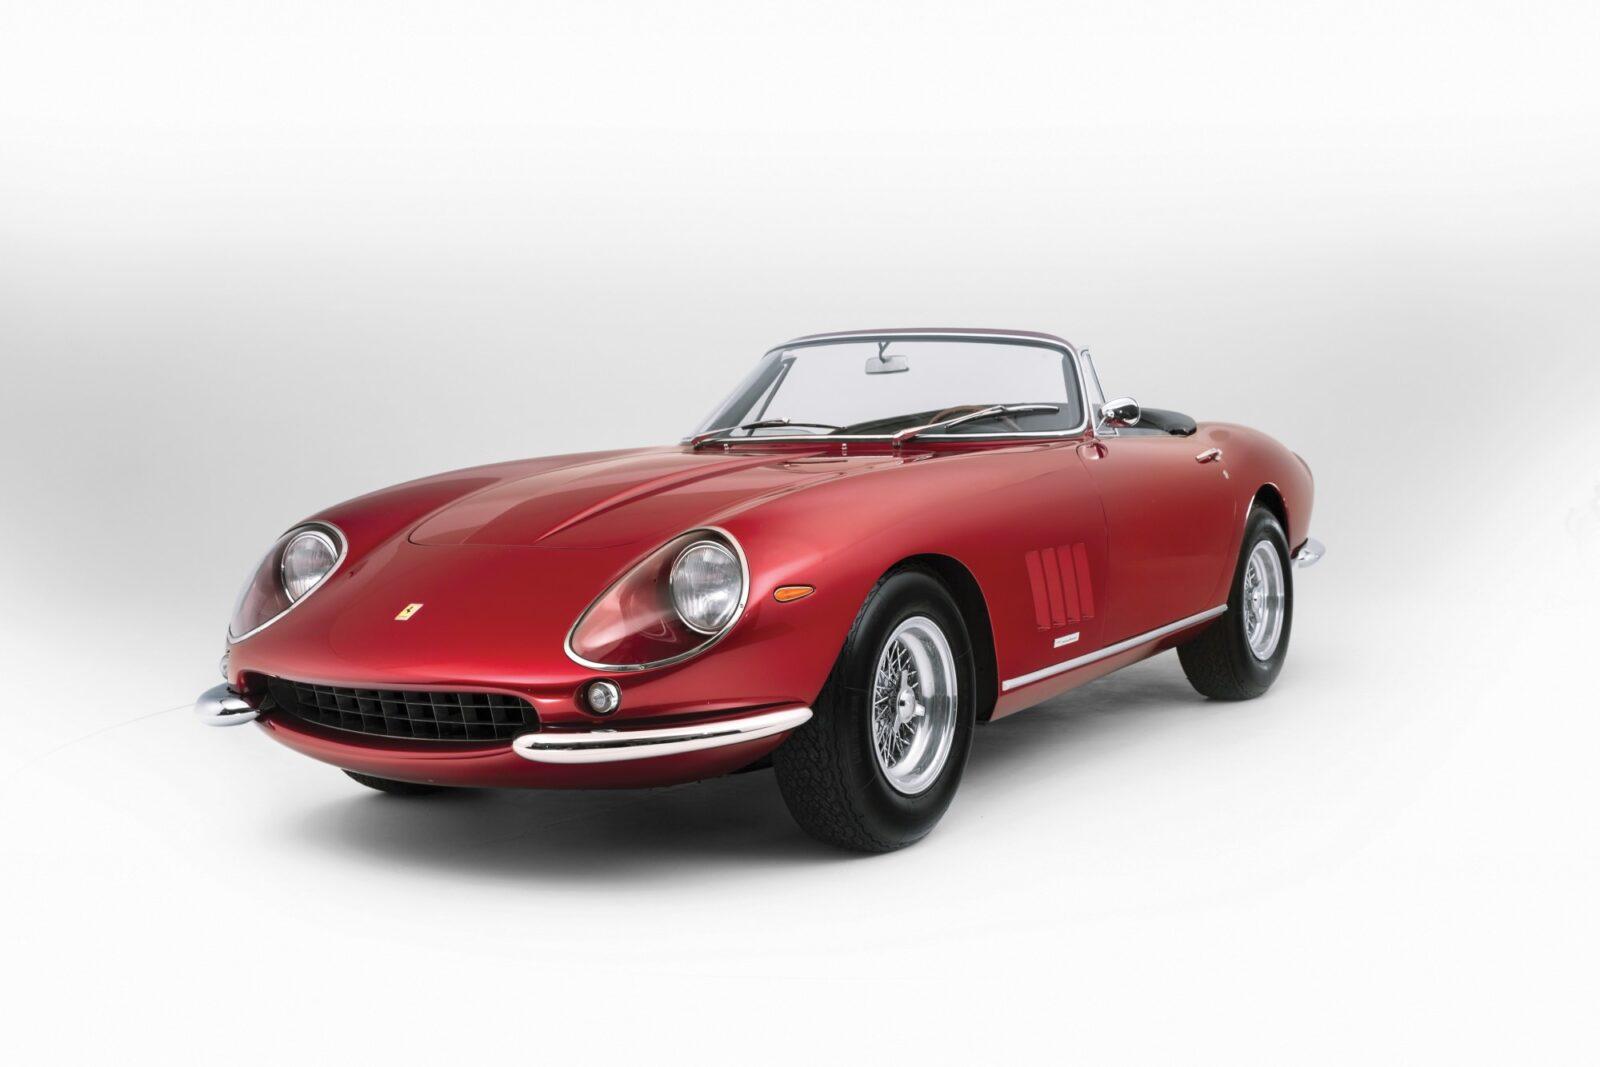 Ferrari 275 Car 1 1600x1067 - Ferrari 275 GTS/4 NART Spider